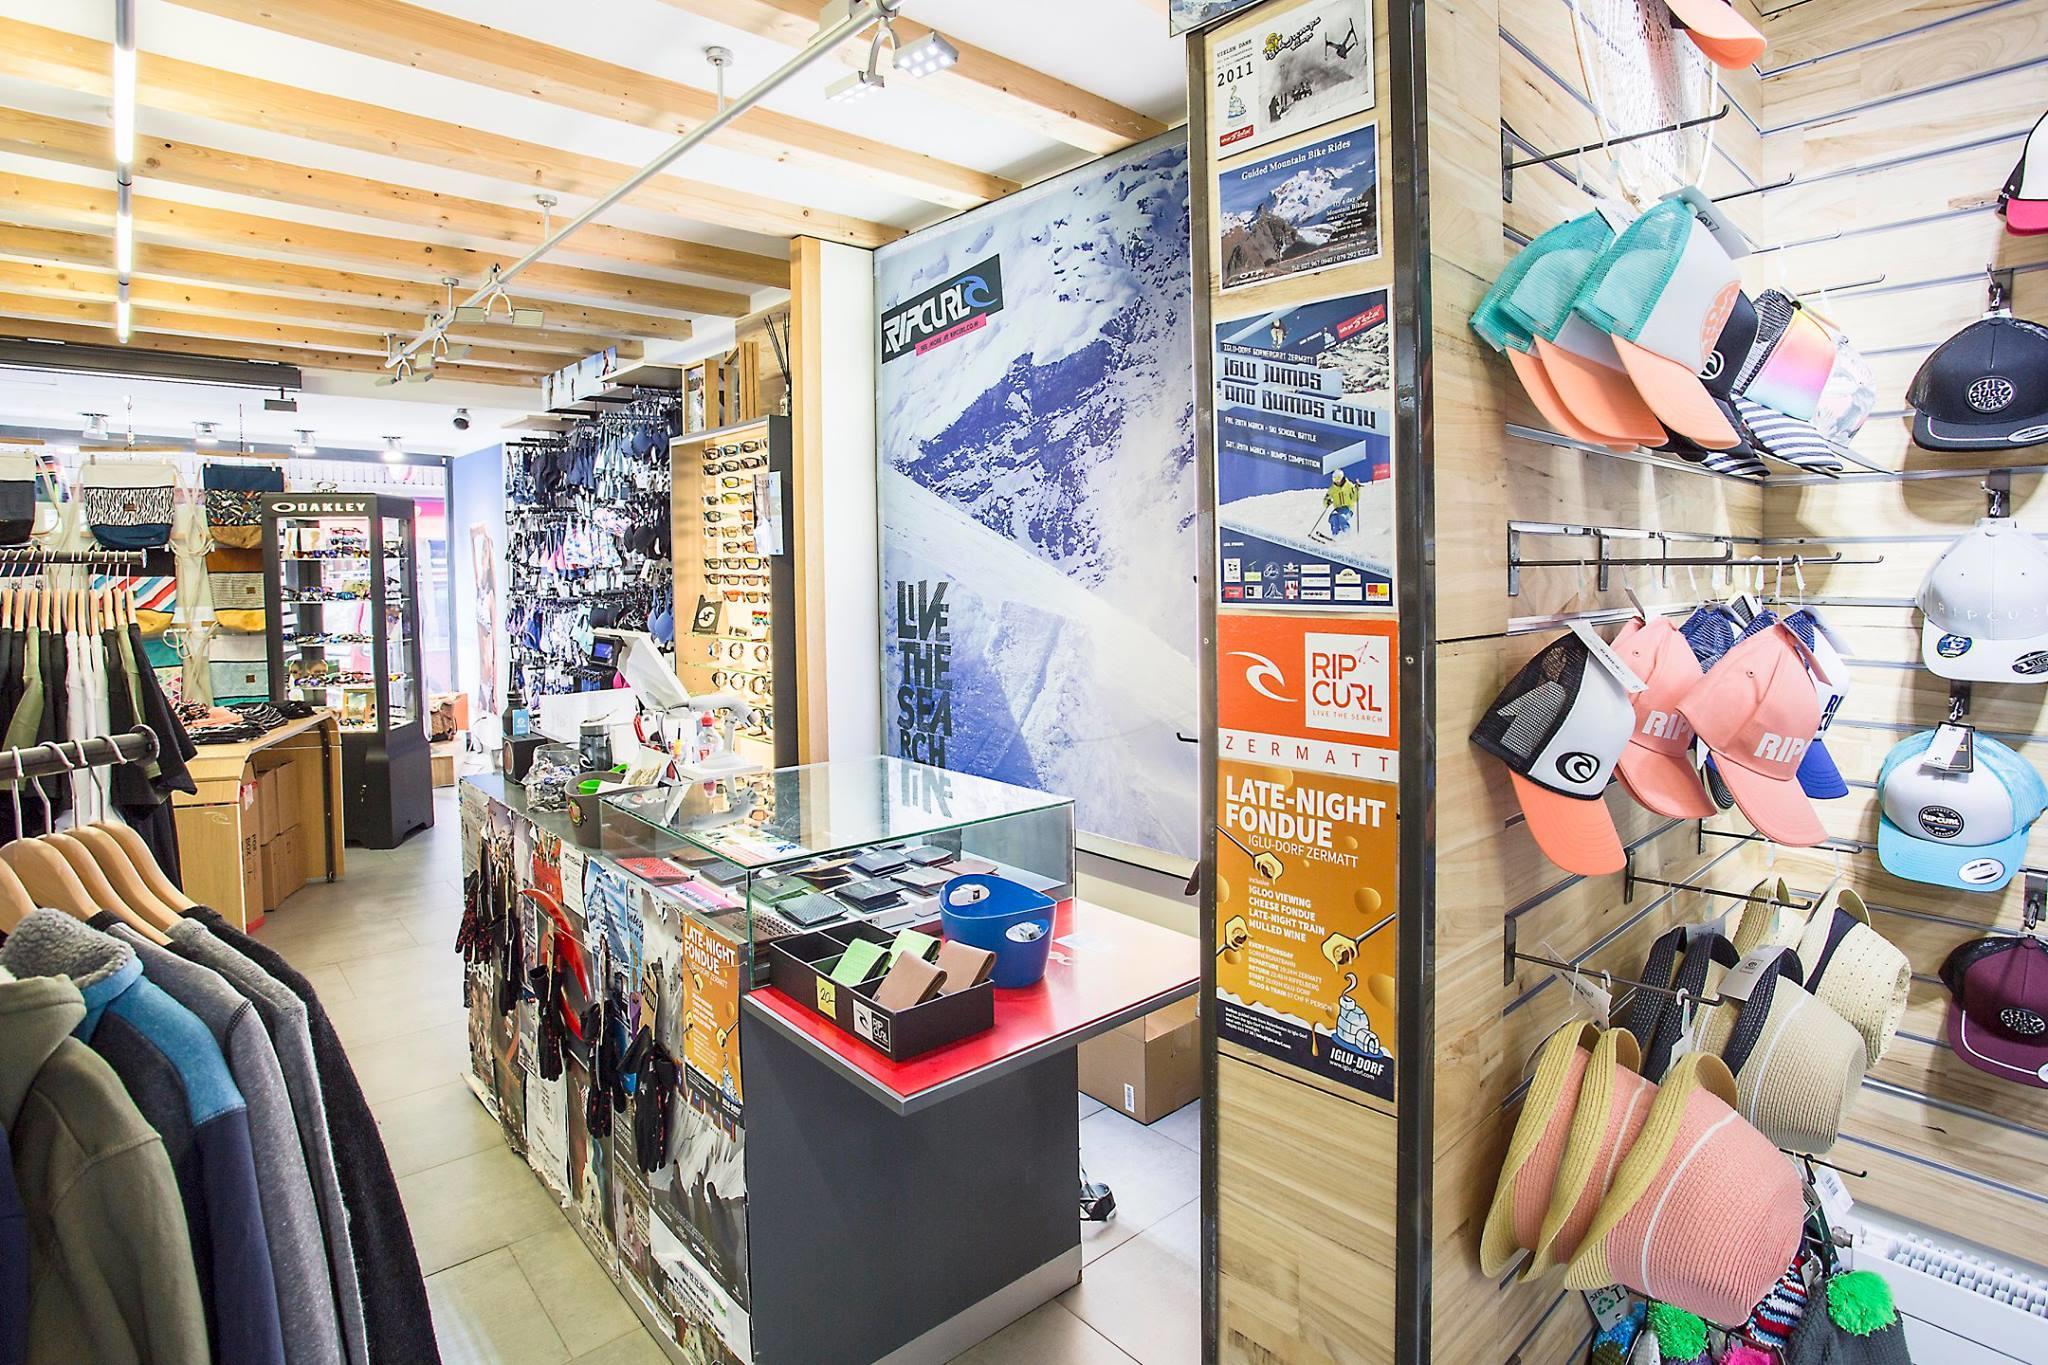 Rip Curl Pro Store Zermatt